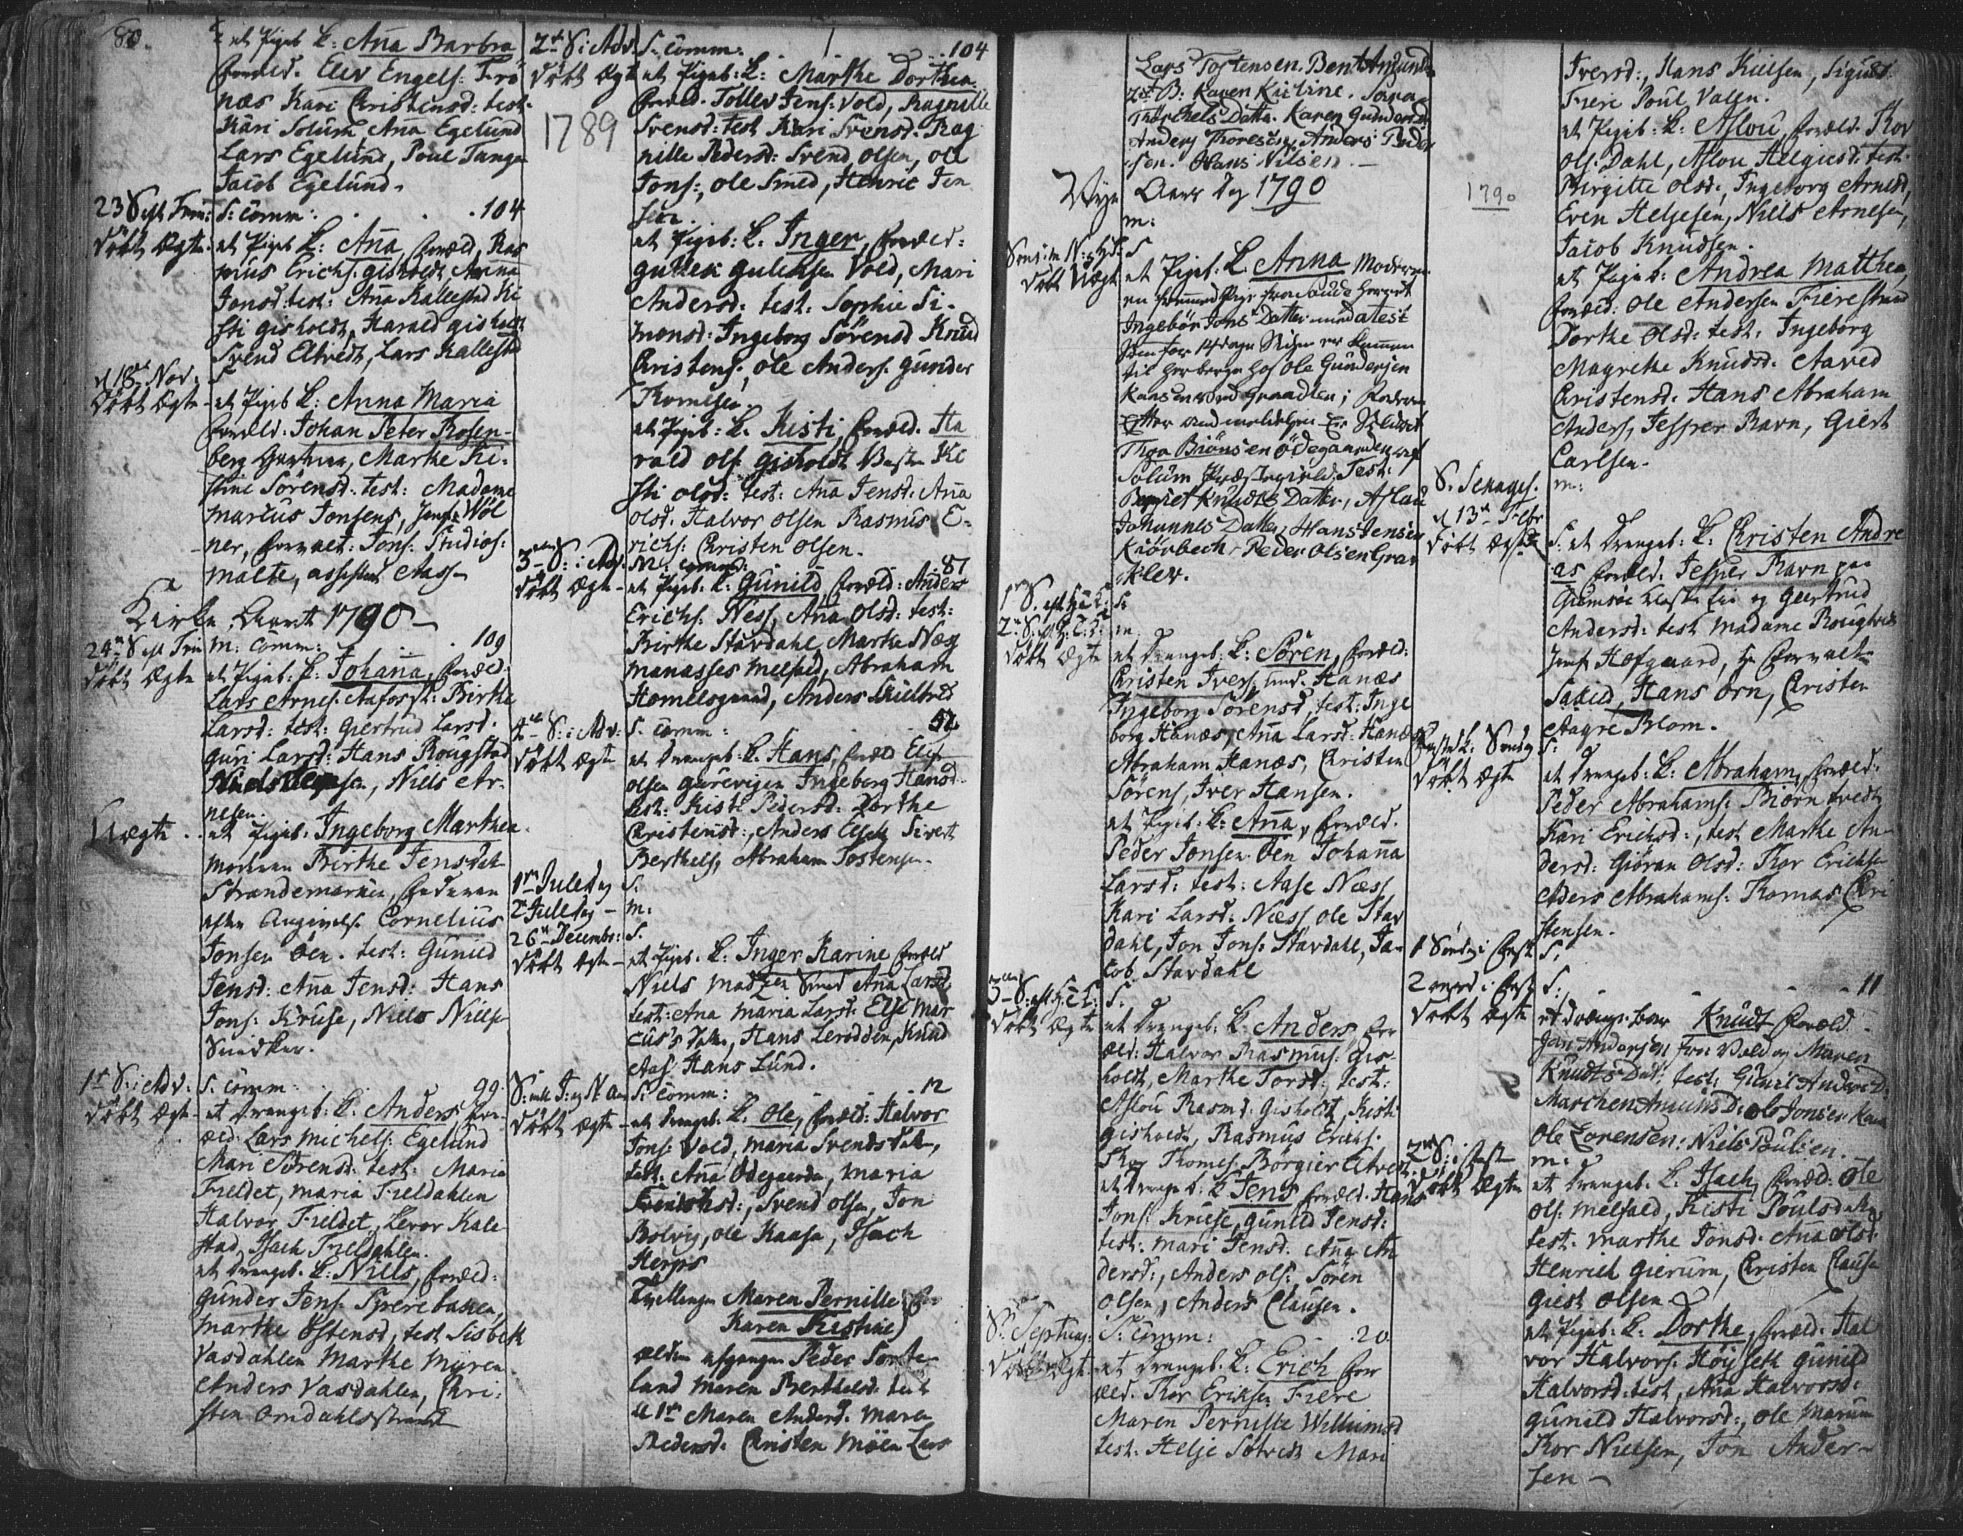 SAKO, Solum kirkebøker, F/Fa/L0003: Ministerialbok nr. I 3, 1761-1814, s. 80-81